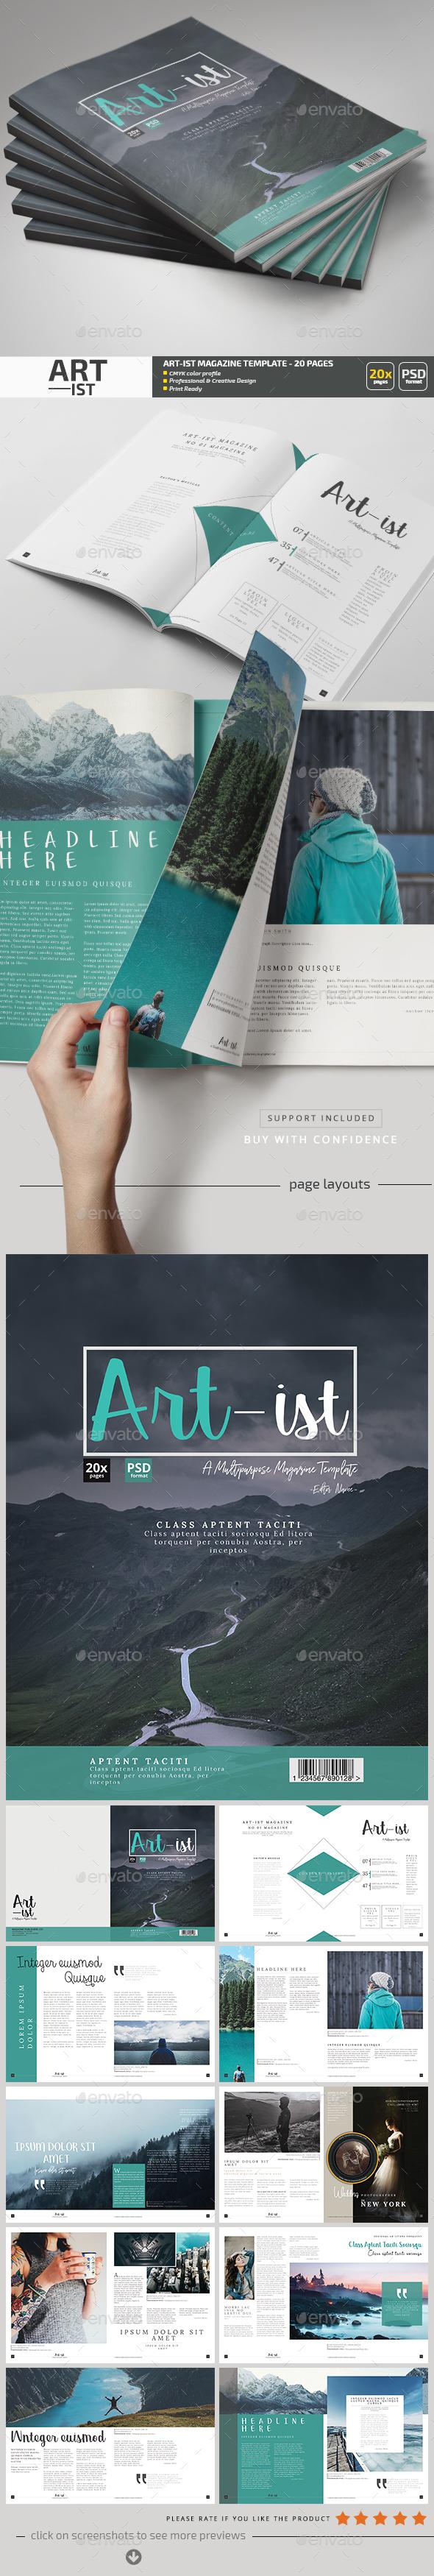 Art-ist Magazine Template V.15 - Magazines Print Templates